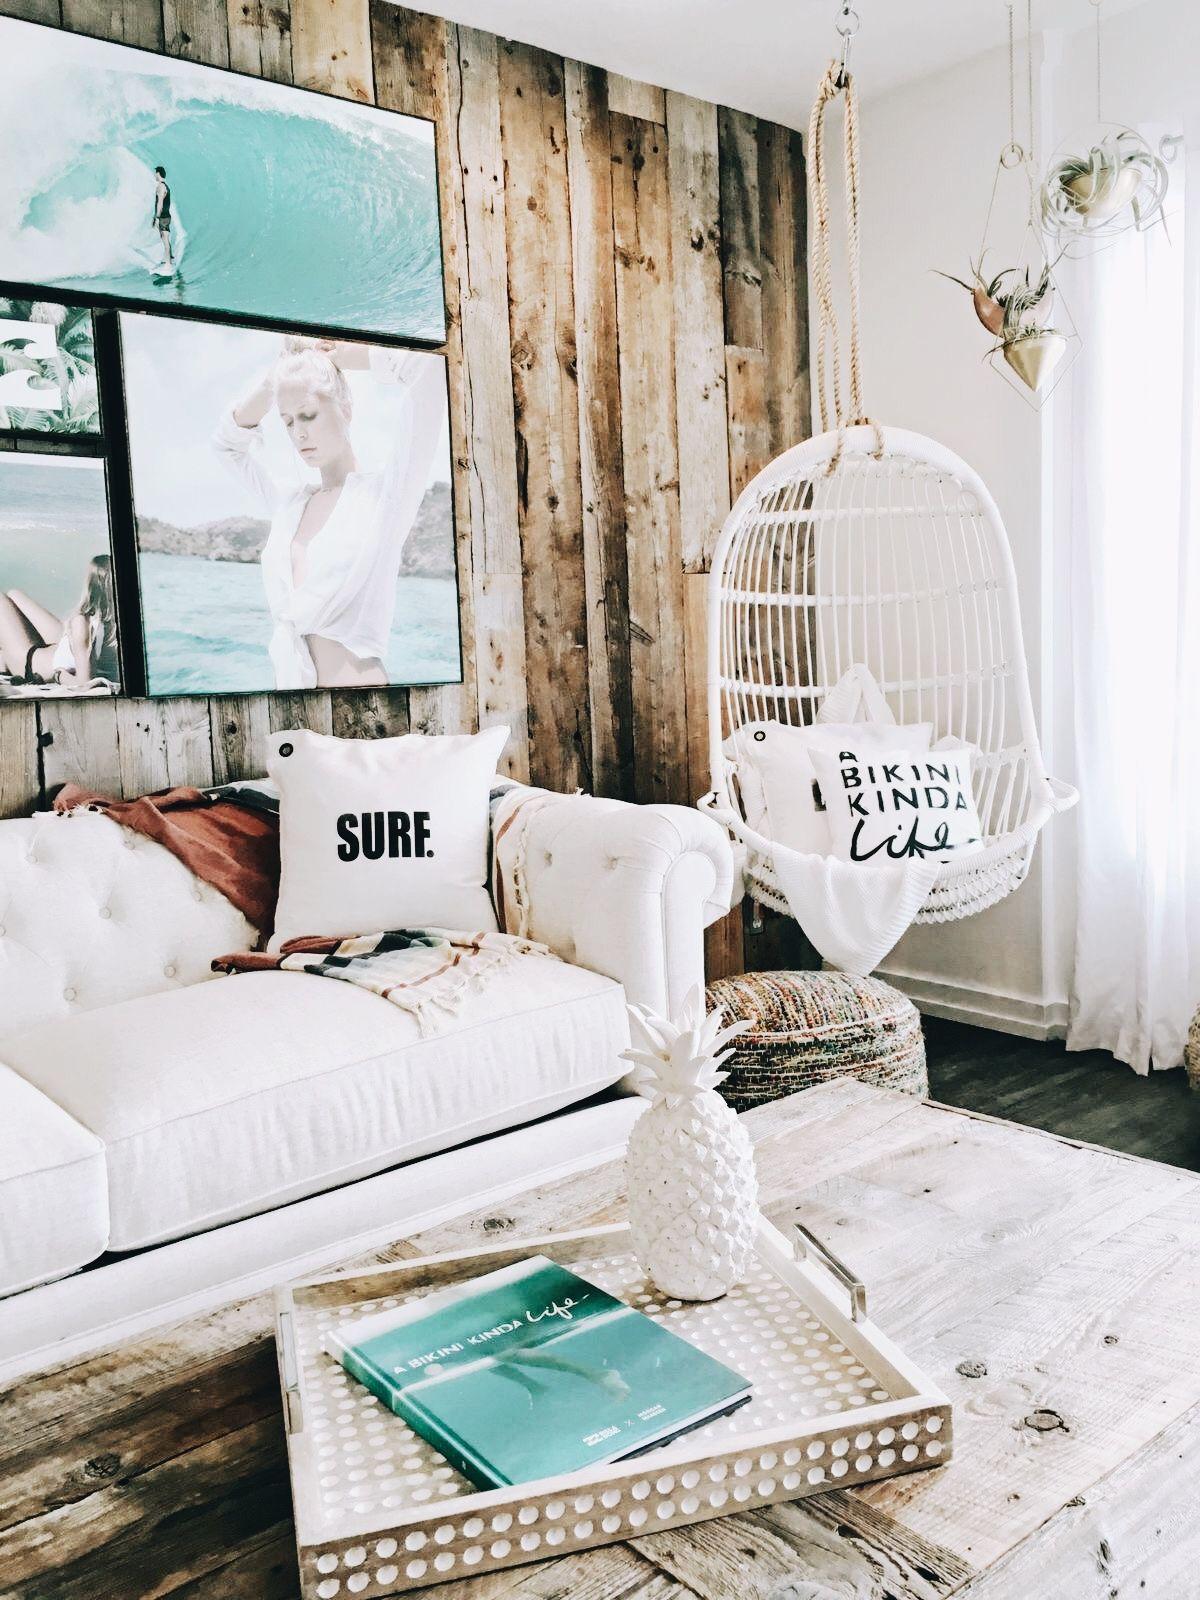 Beachy living room P I N T E R E S T : @pollnow2002 in 2019 ...